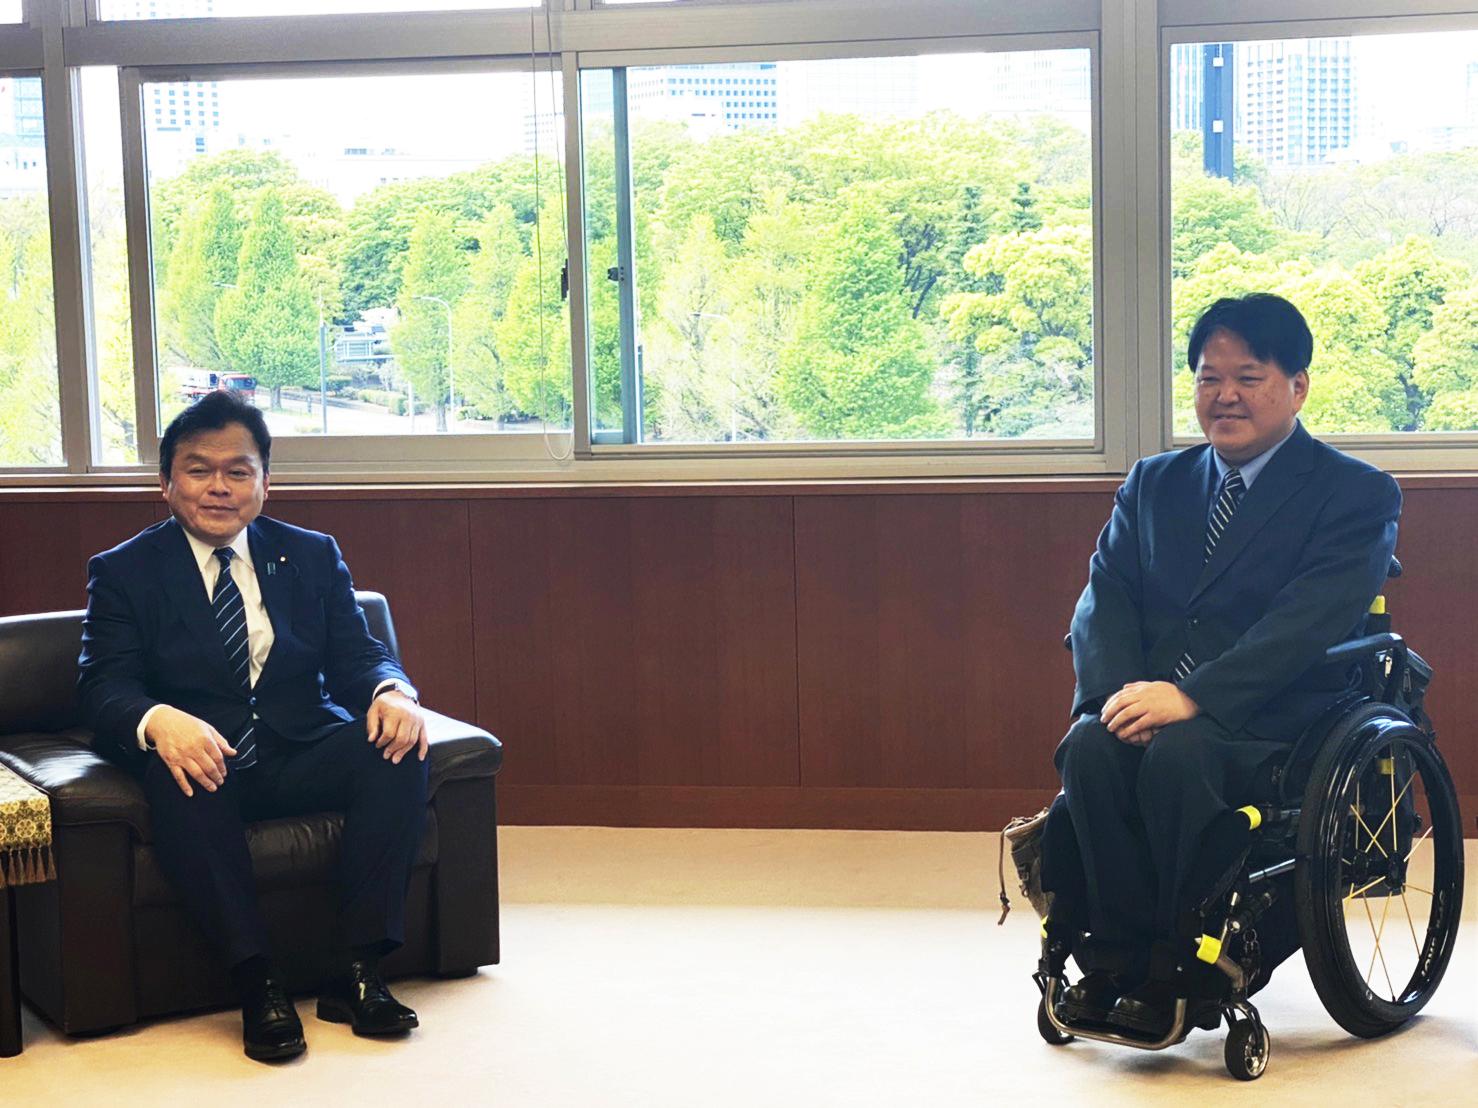 赤羽大臣と佐藤